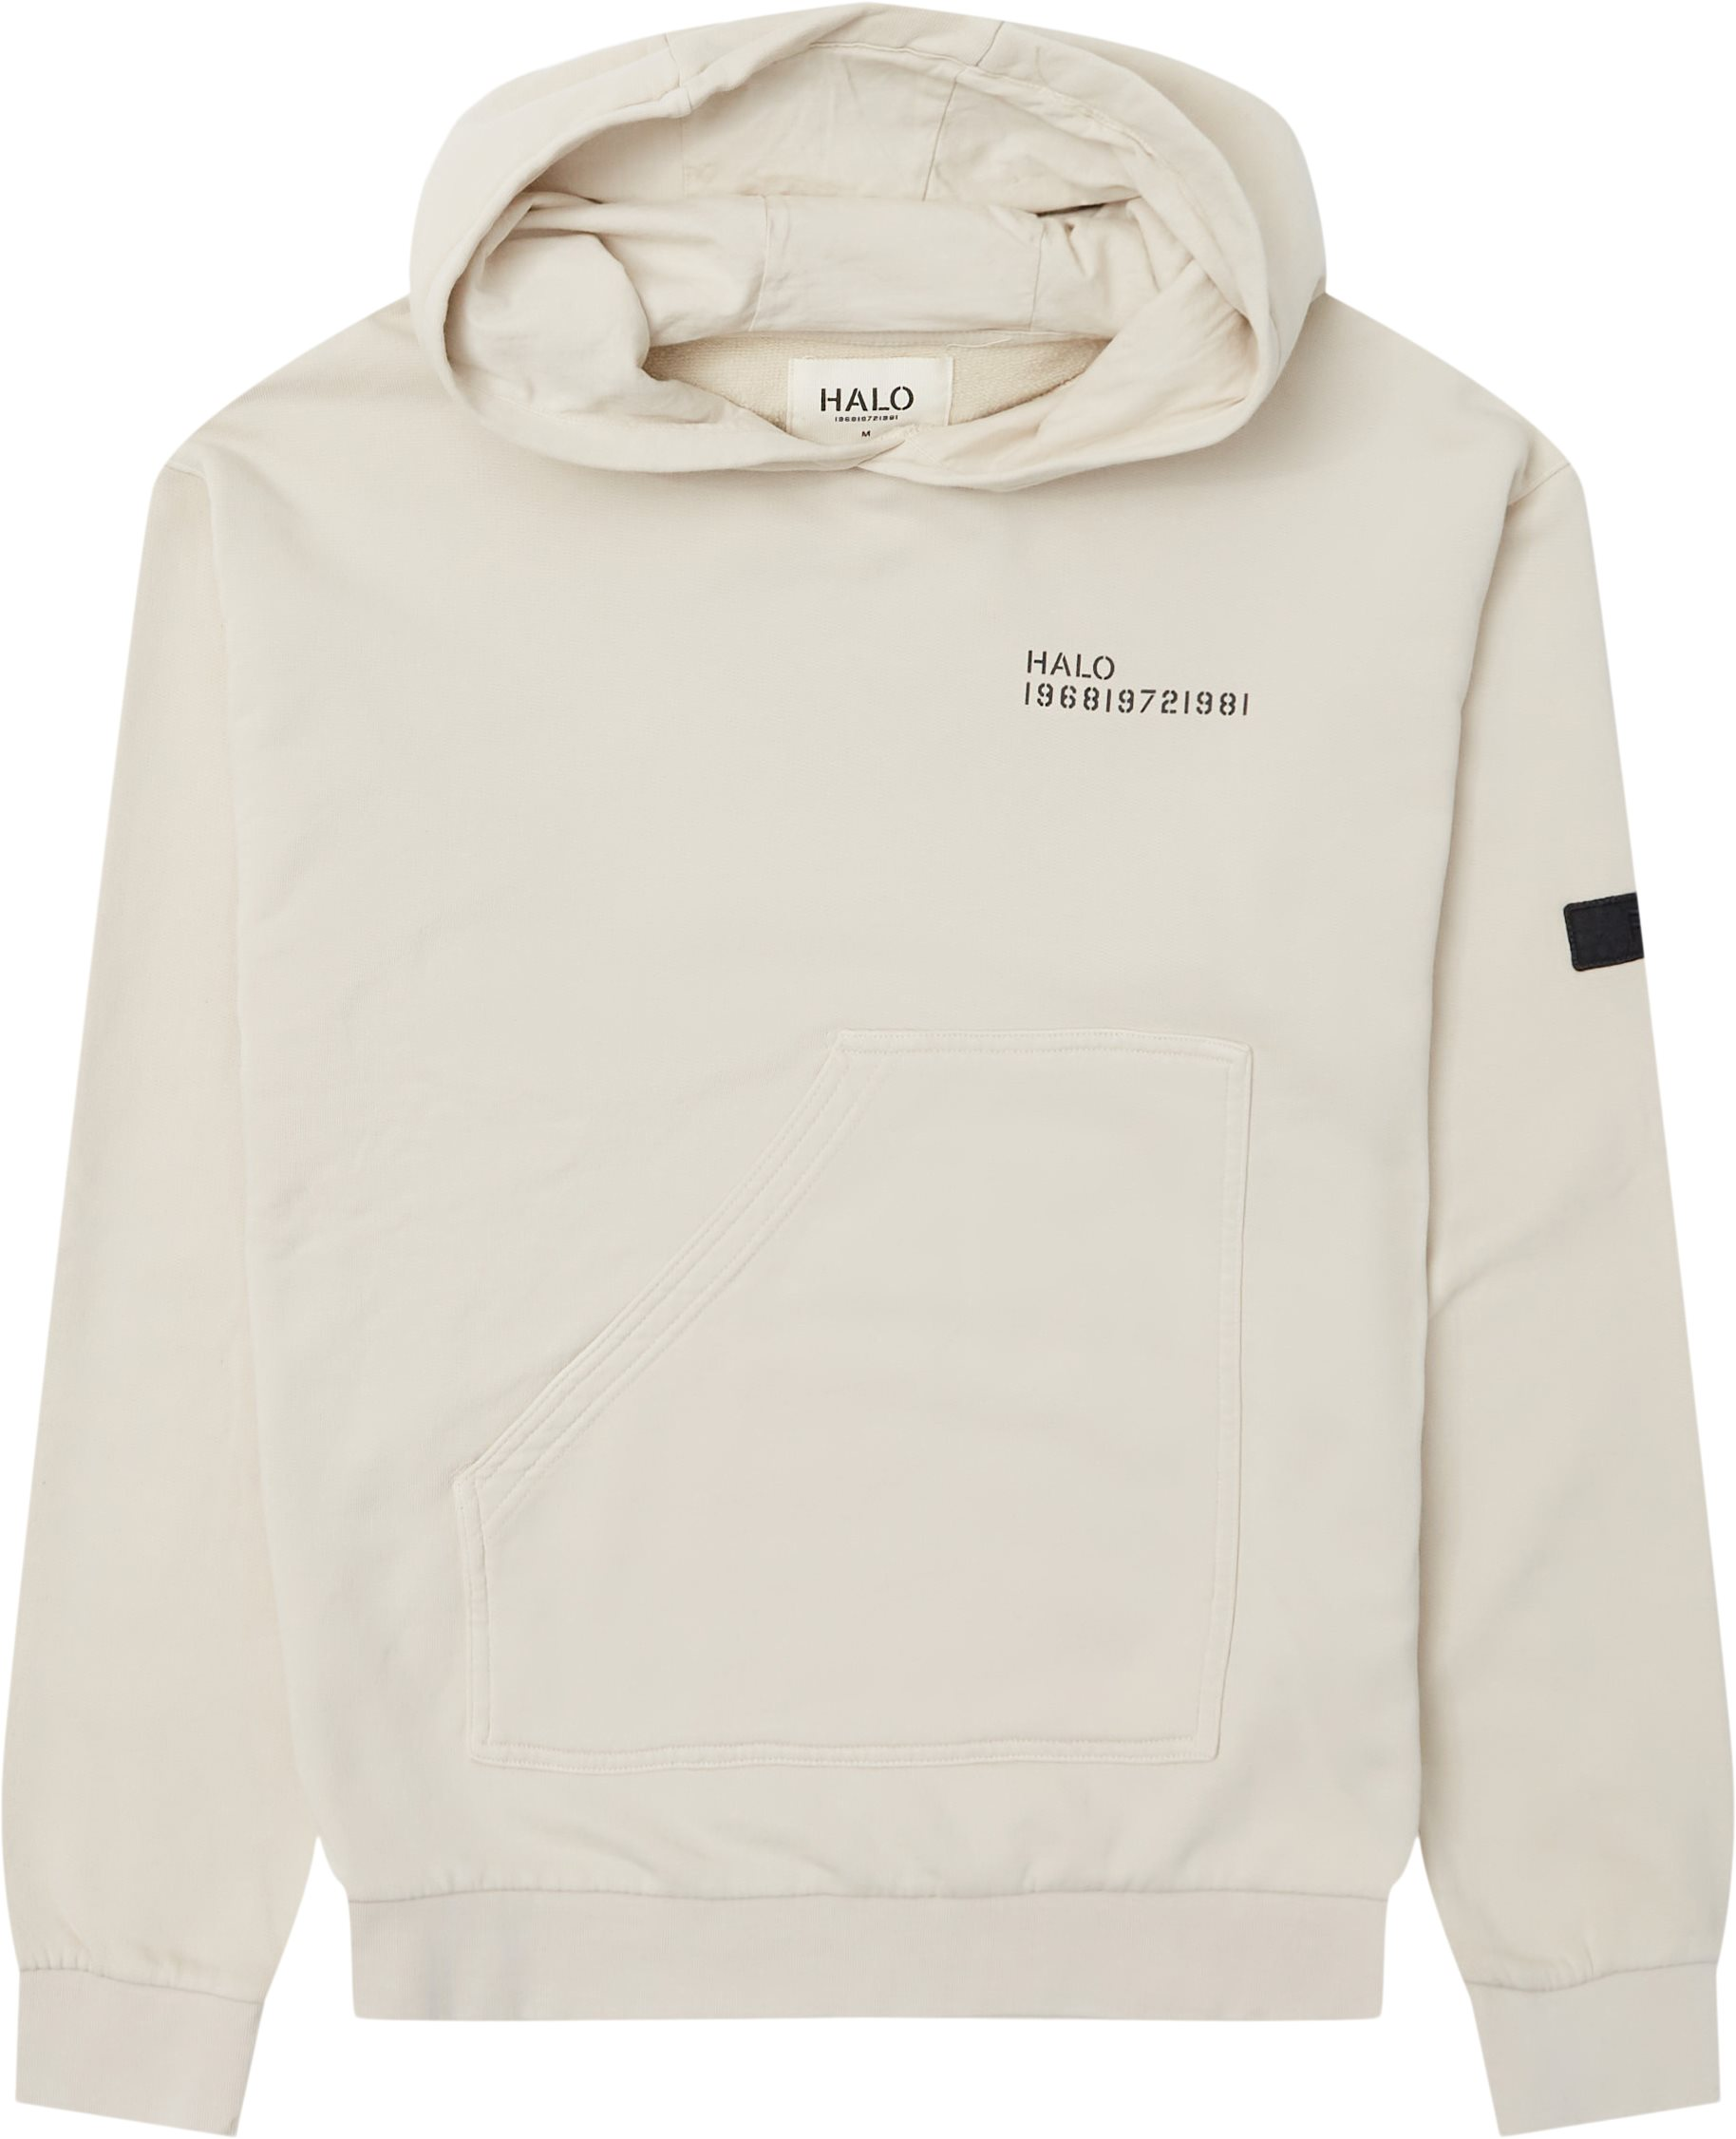 Sweatshirts - Vit